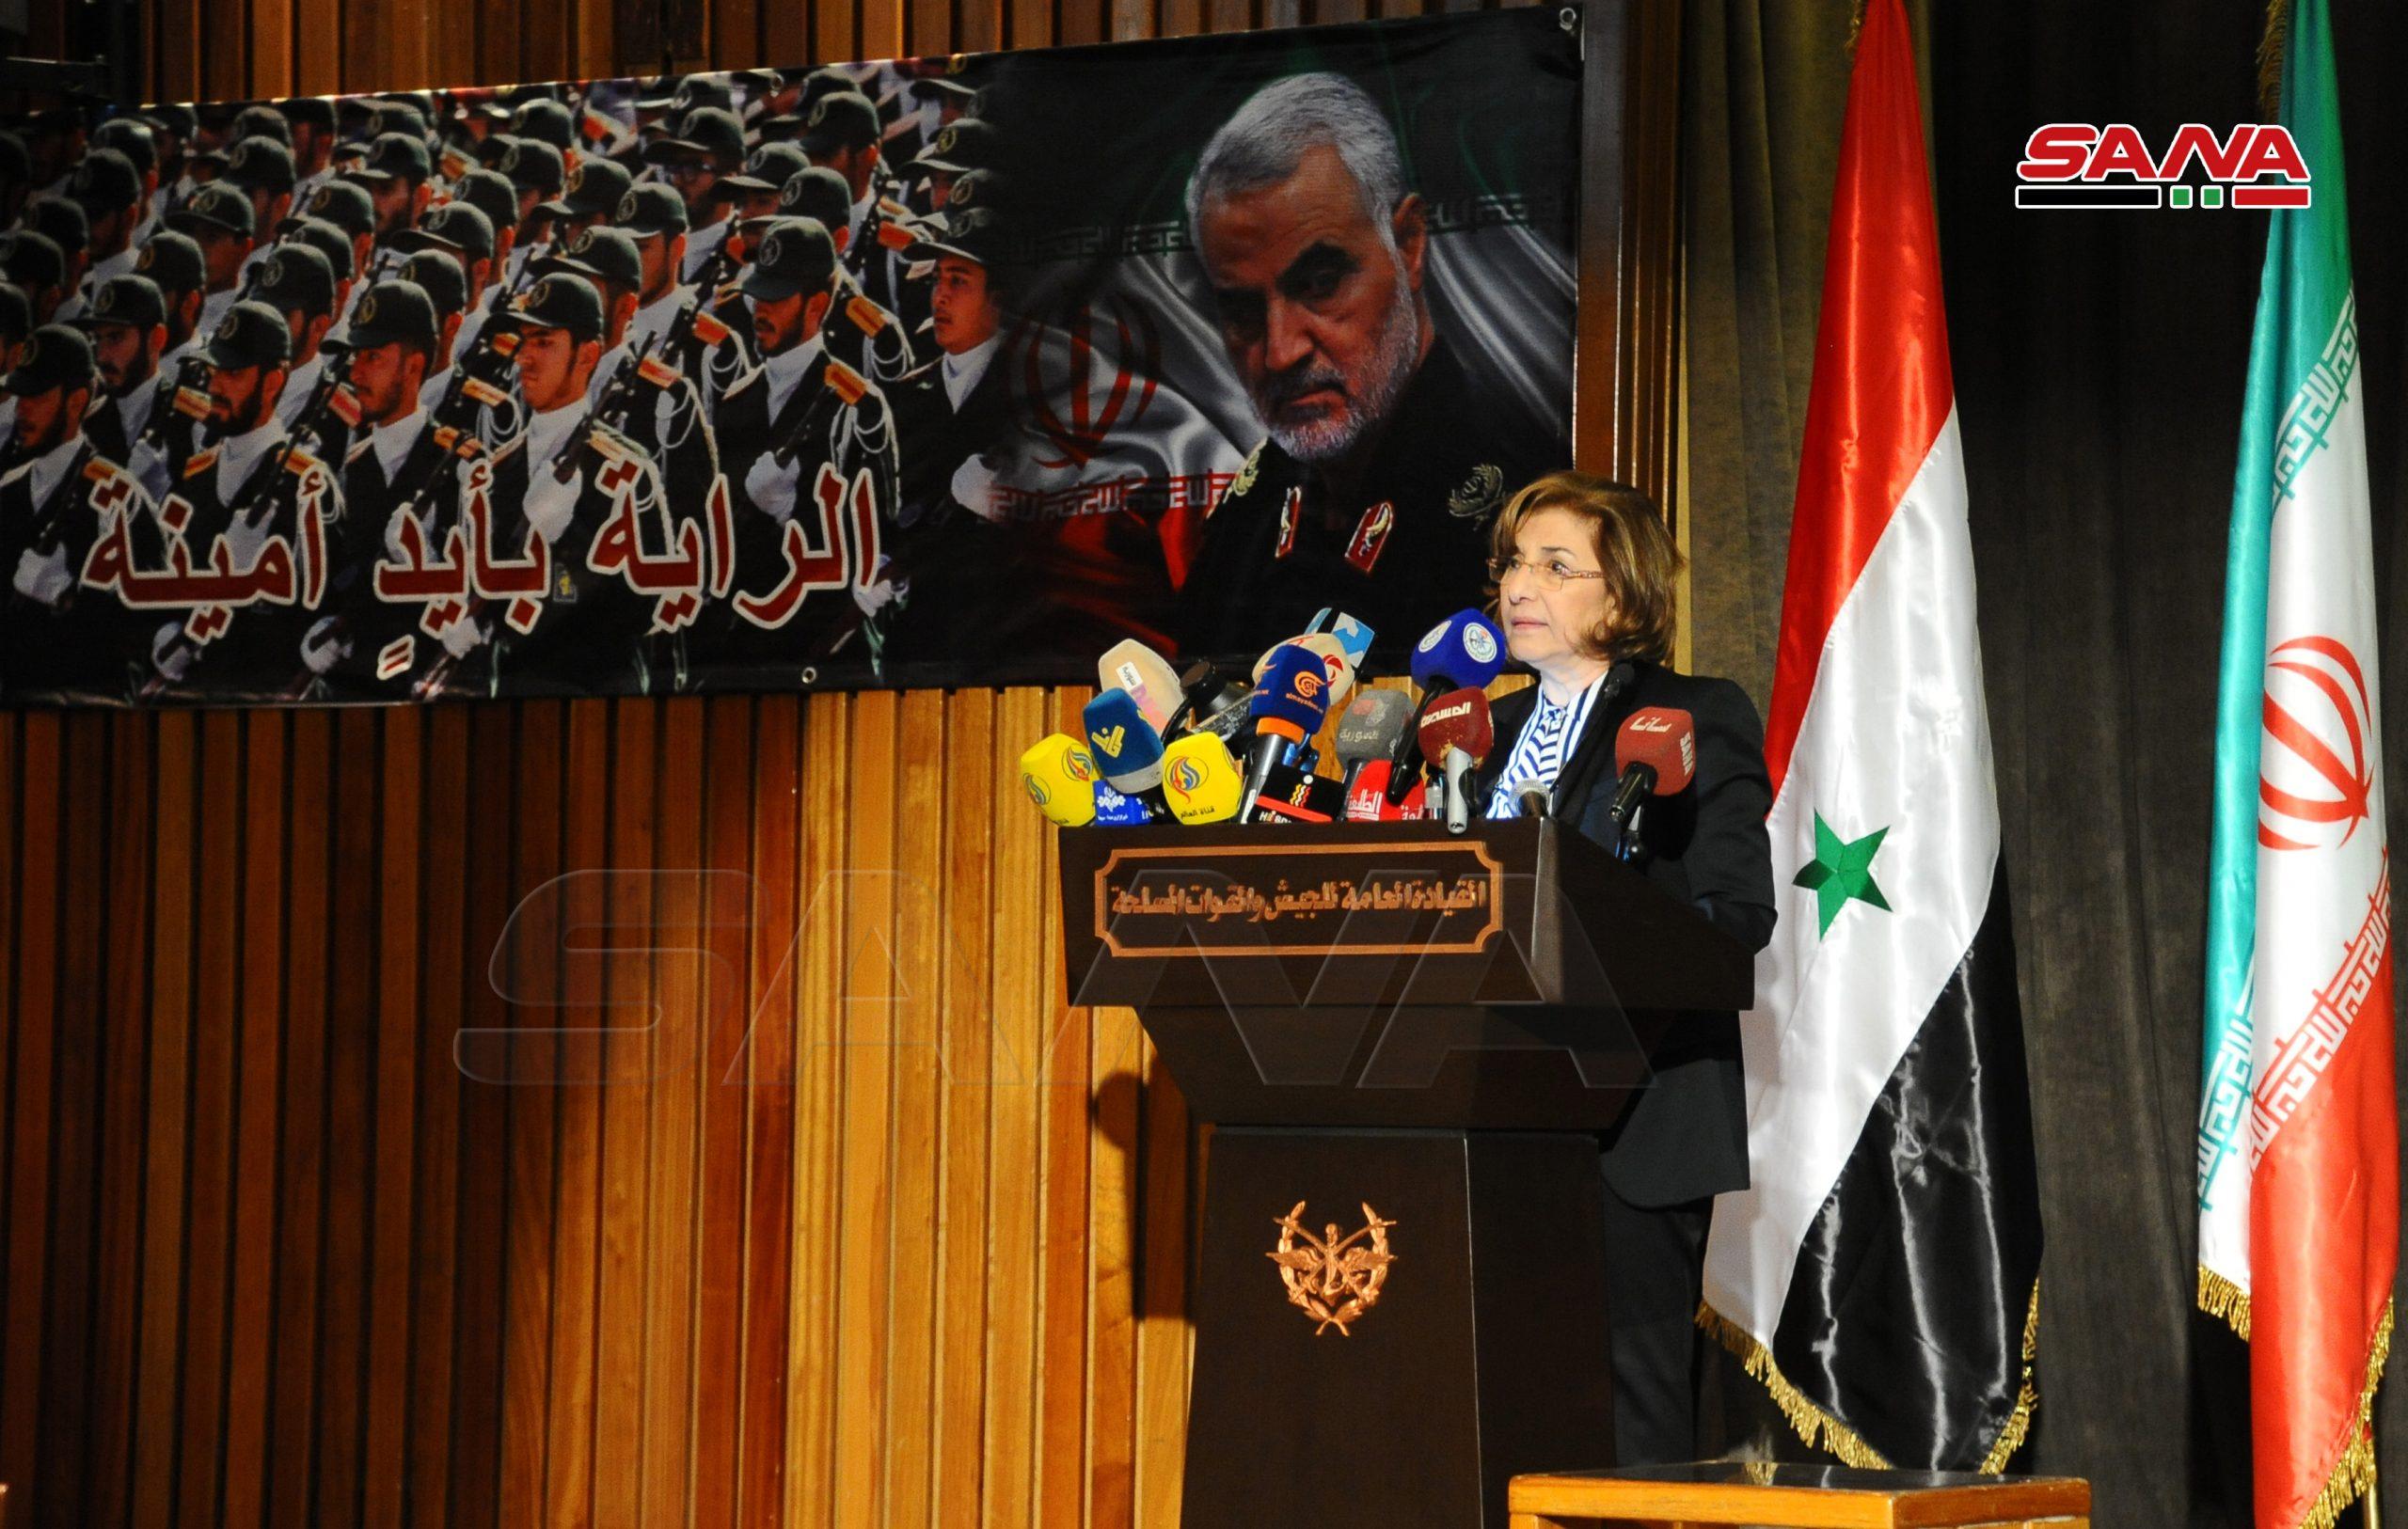 Photo of القيادة الجيش تقيم حفلاً تأبينياً للشهيد الفريق سليماني